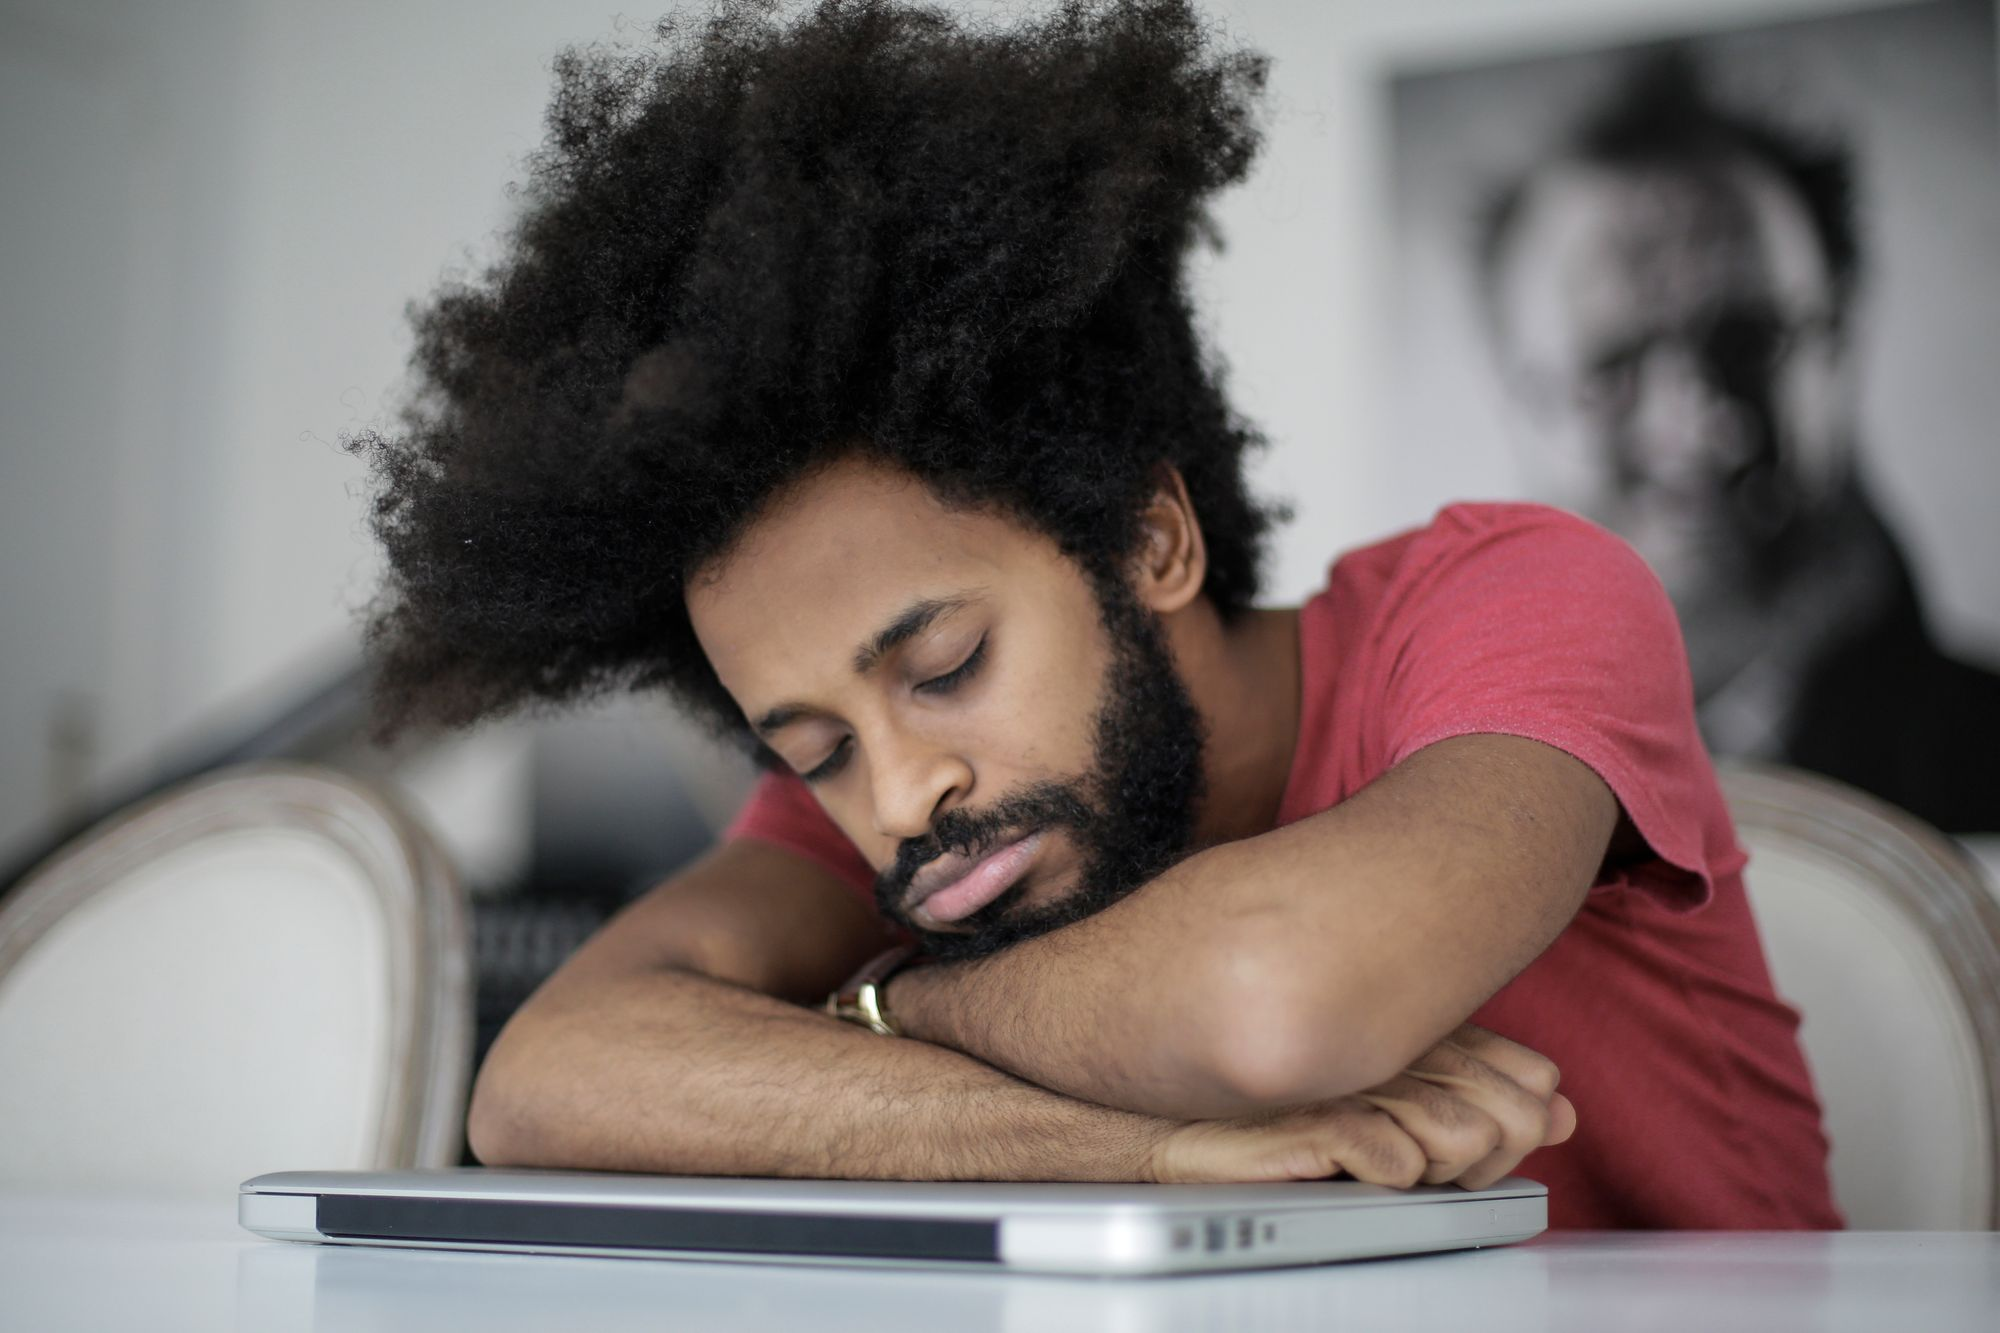 Man sleeping on the desk